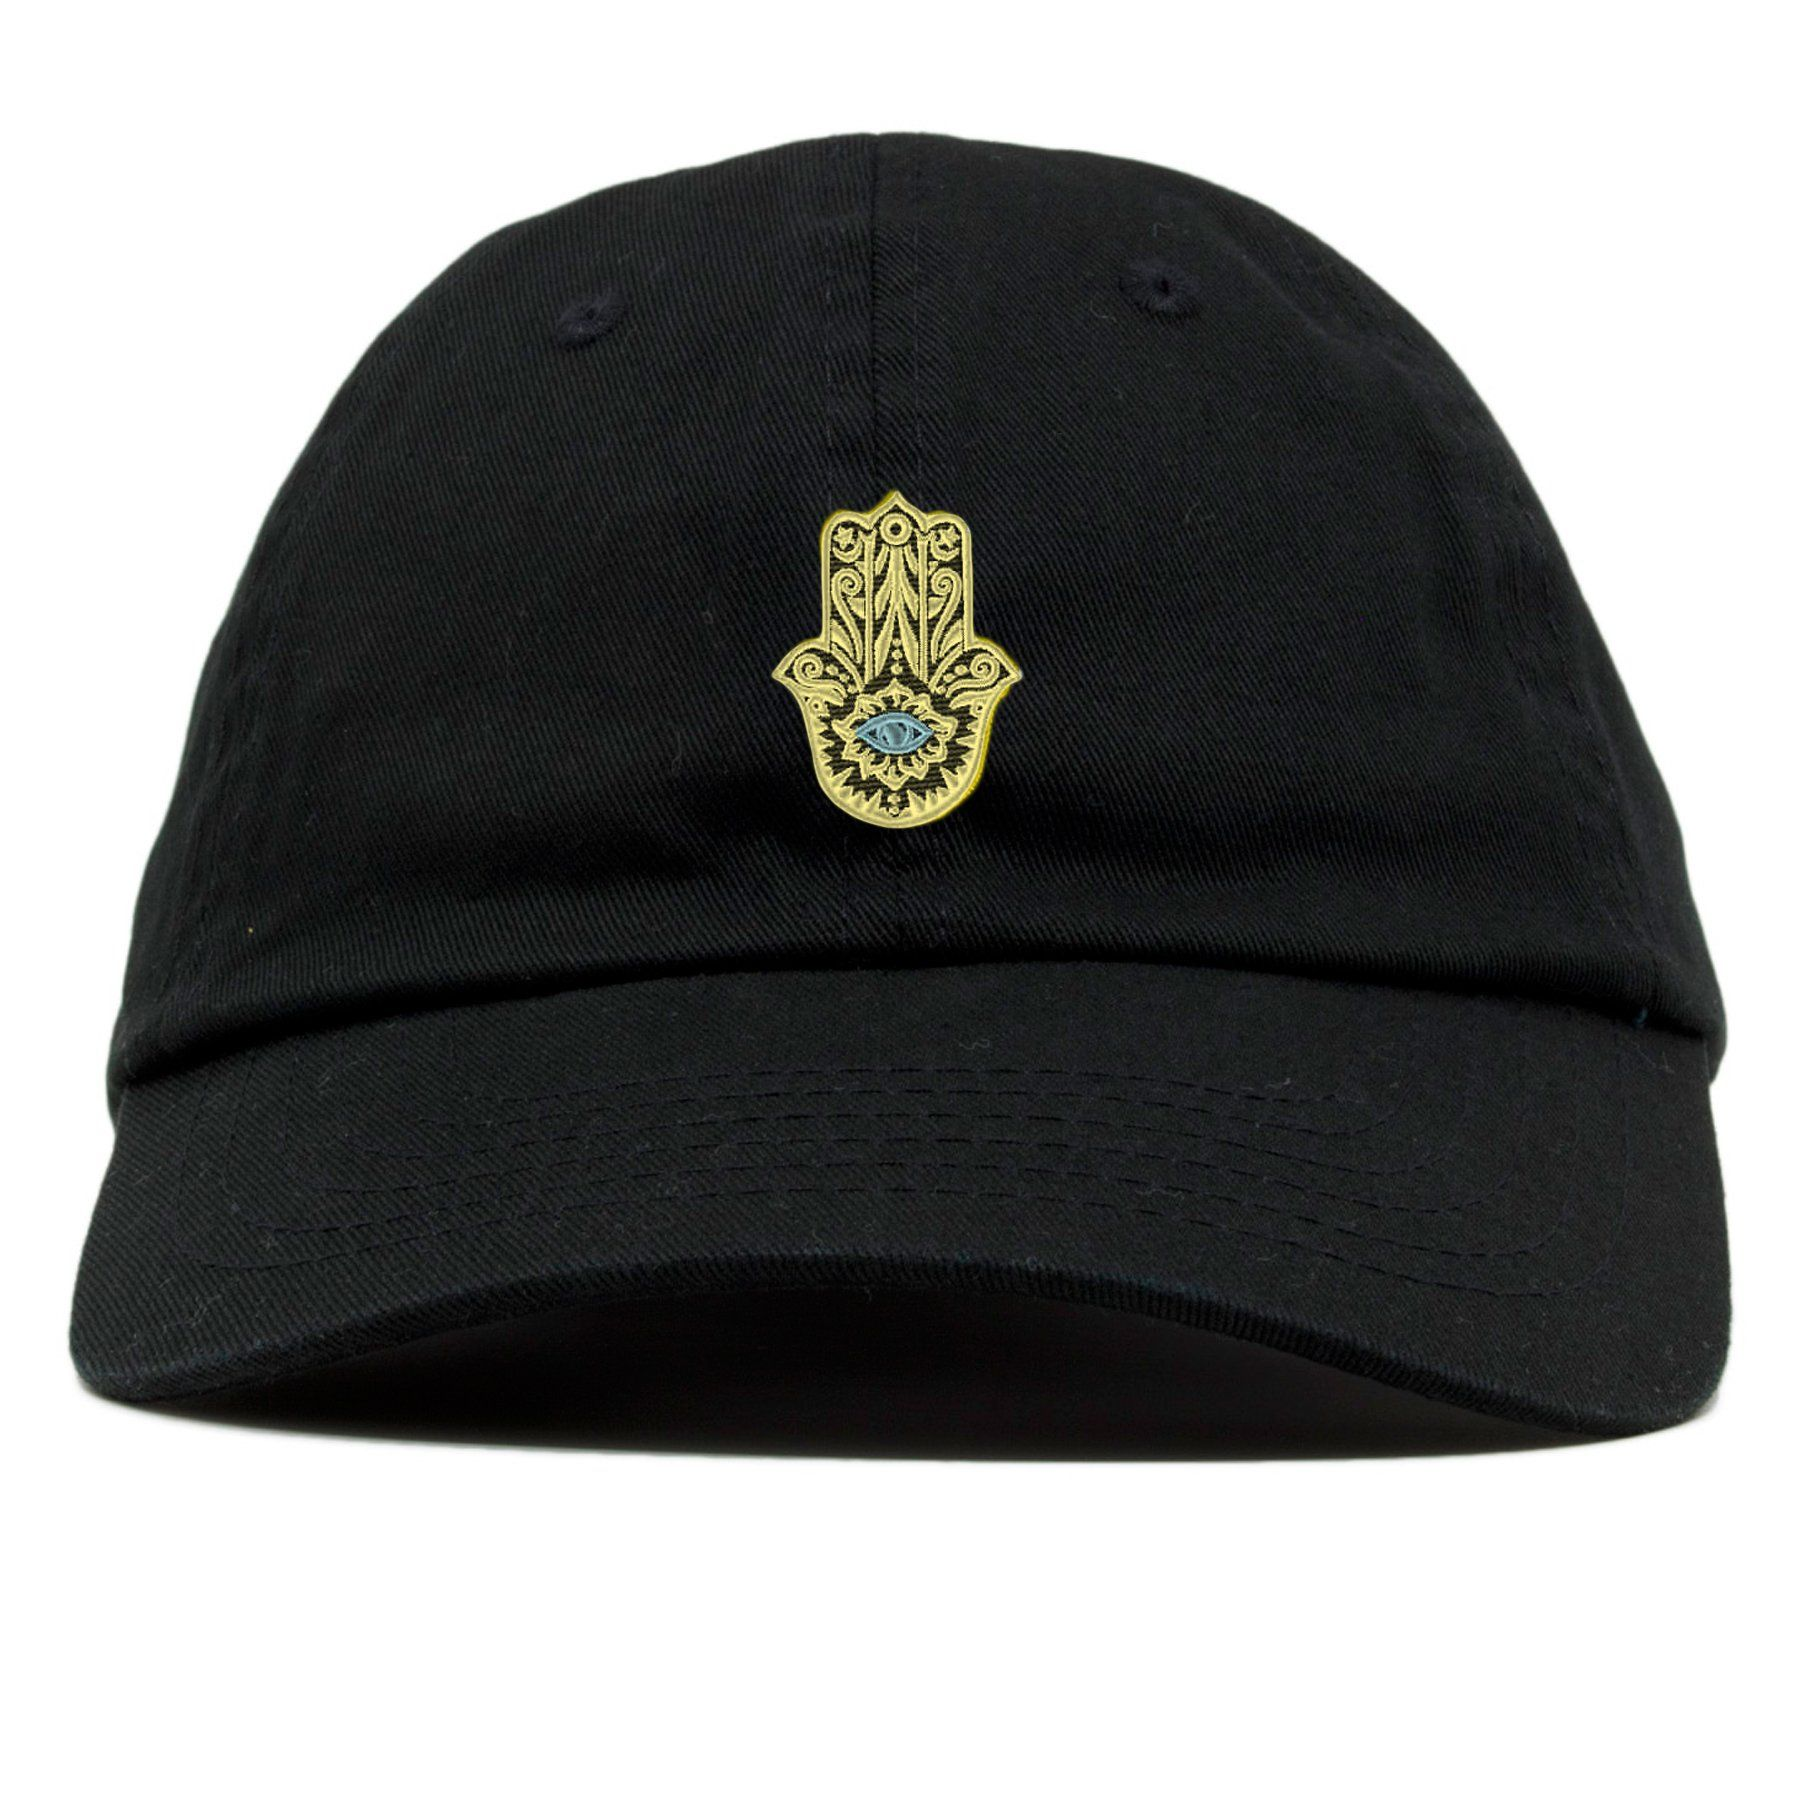 61a2f0a454bac Hamsa Hand of Fatima Protective Amulet Black Dad Hat